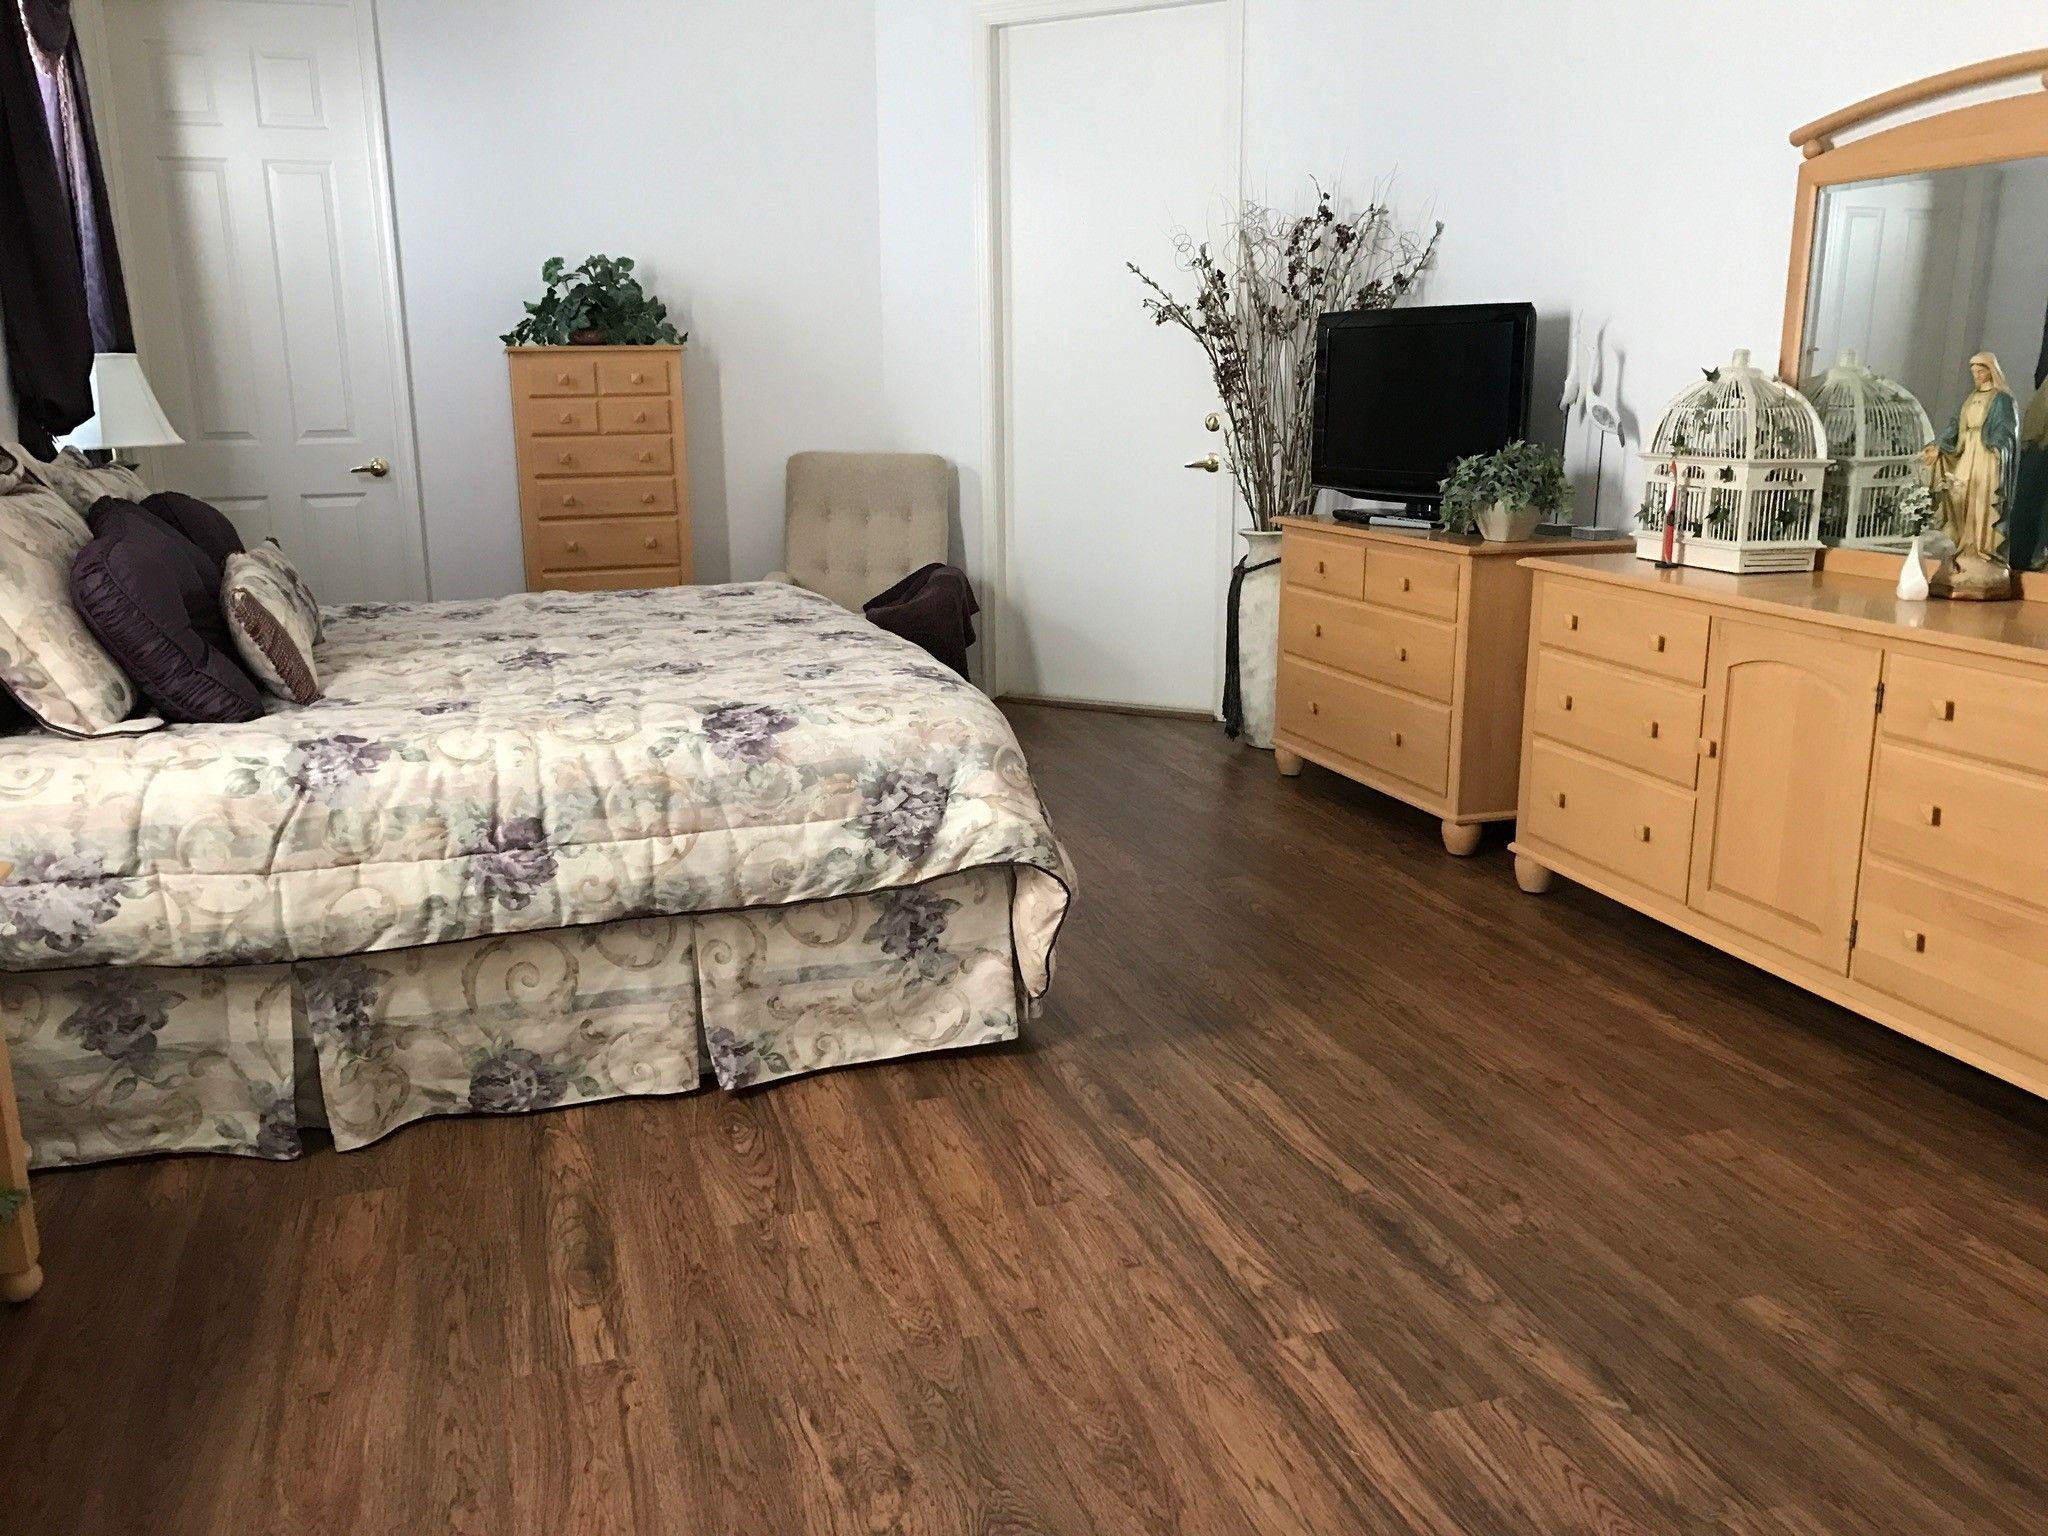 Average Price Of Carpet Installed